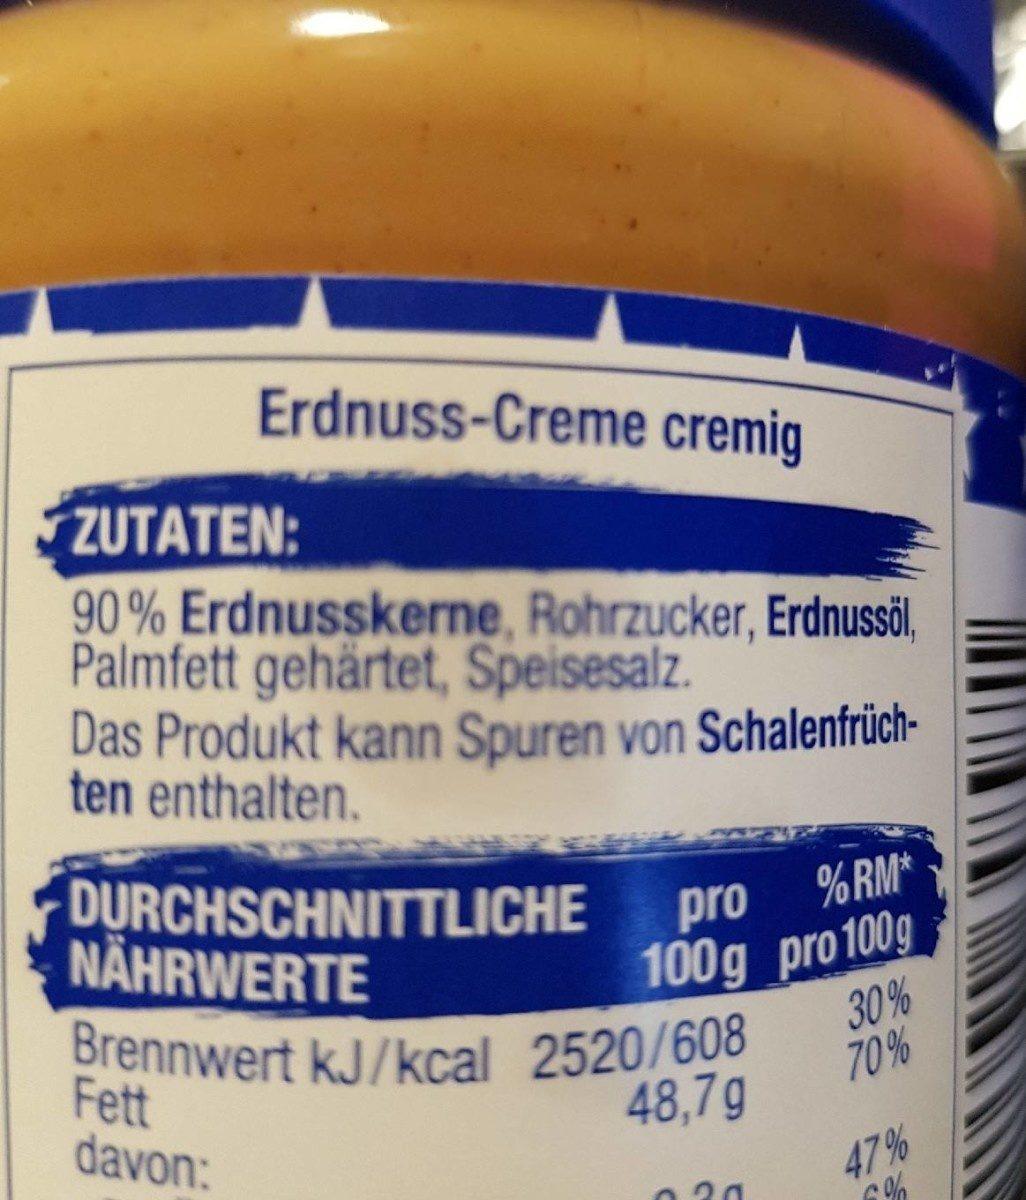 Erdnuss-Creme - Ingrédients - fr